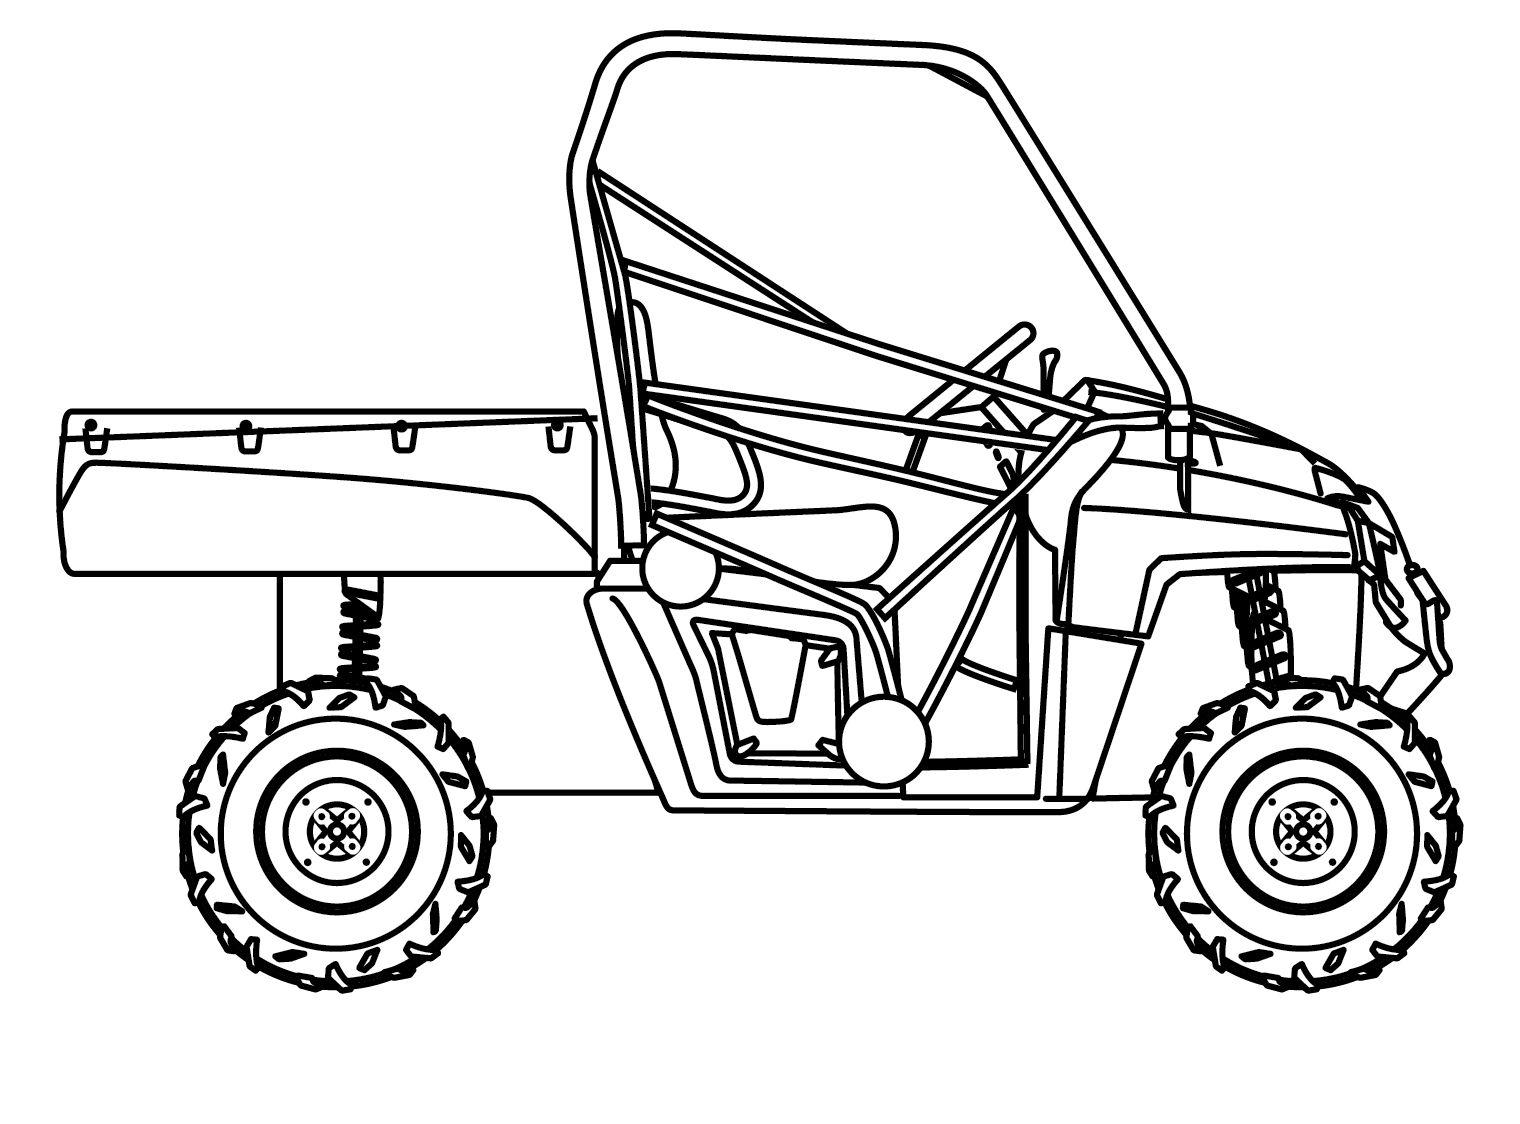 Polaris Ranger 400 570 800 Mid Seat Cover